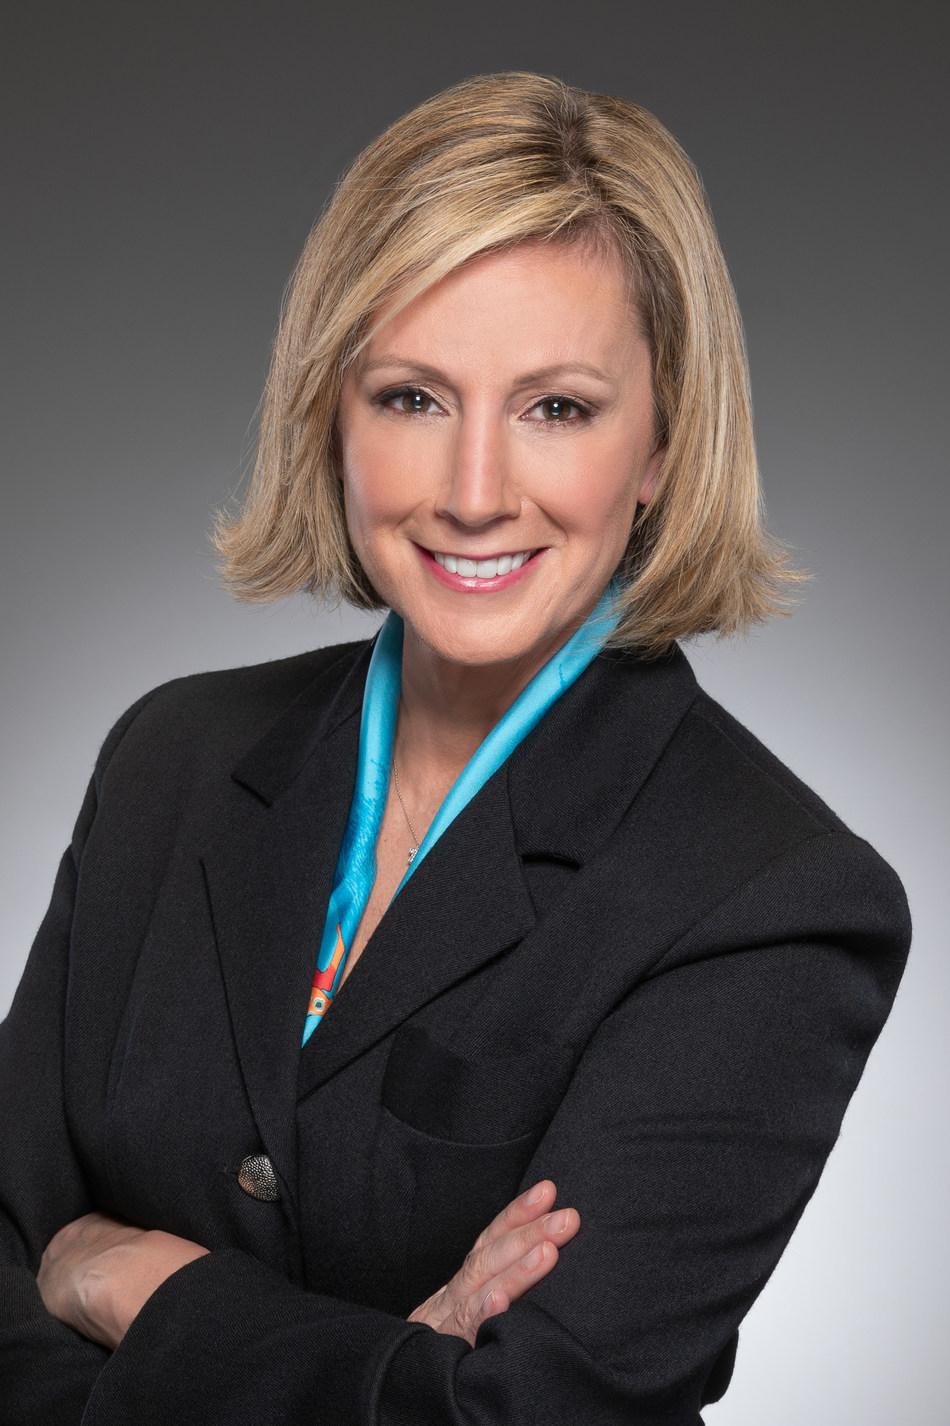 Dr. Evis Babo, President of the Georgia Dental Association